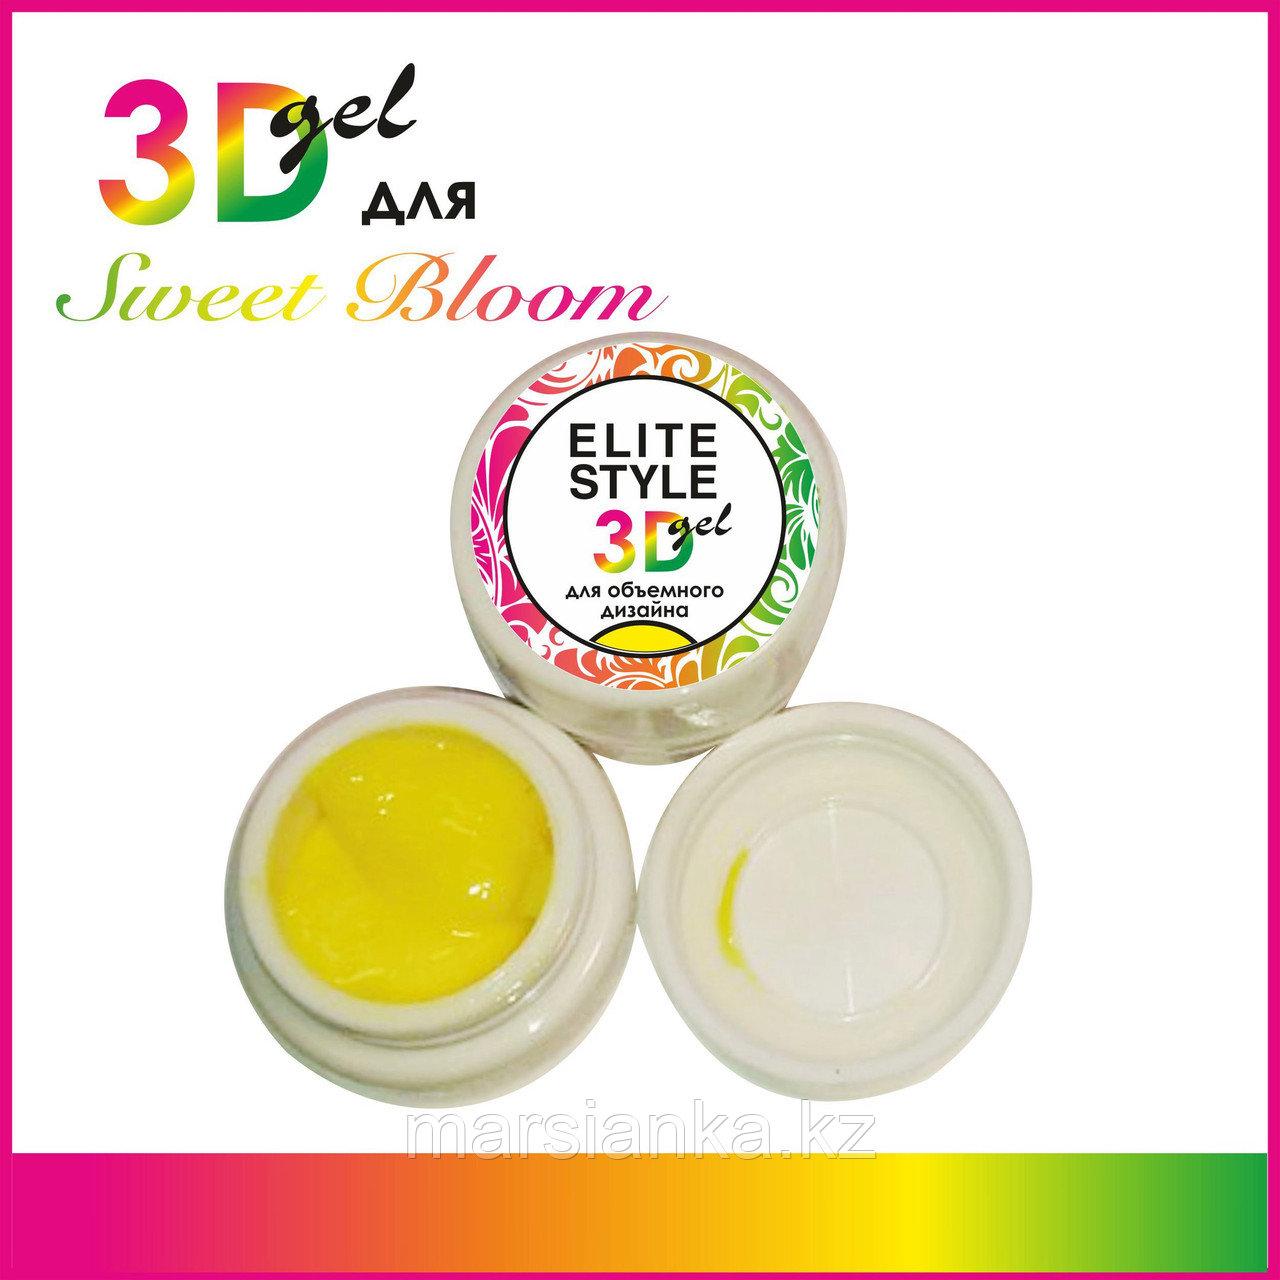 3D гель для объемного дизайна Elite Style, желтый, 5мл